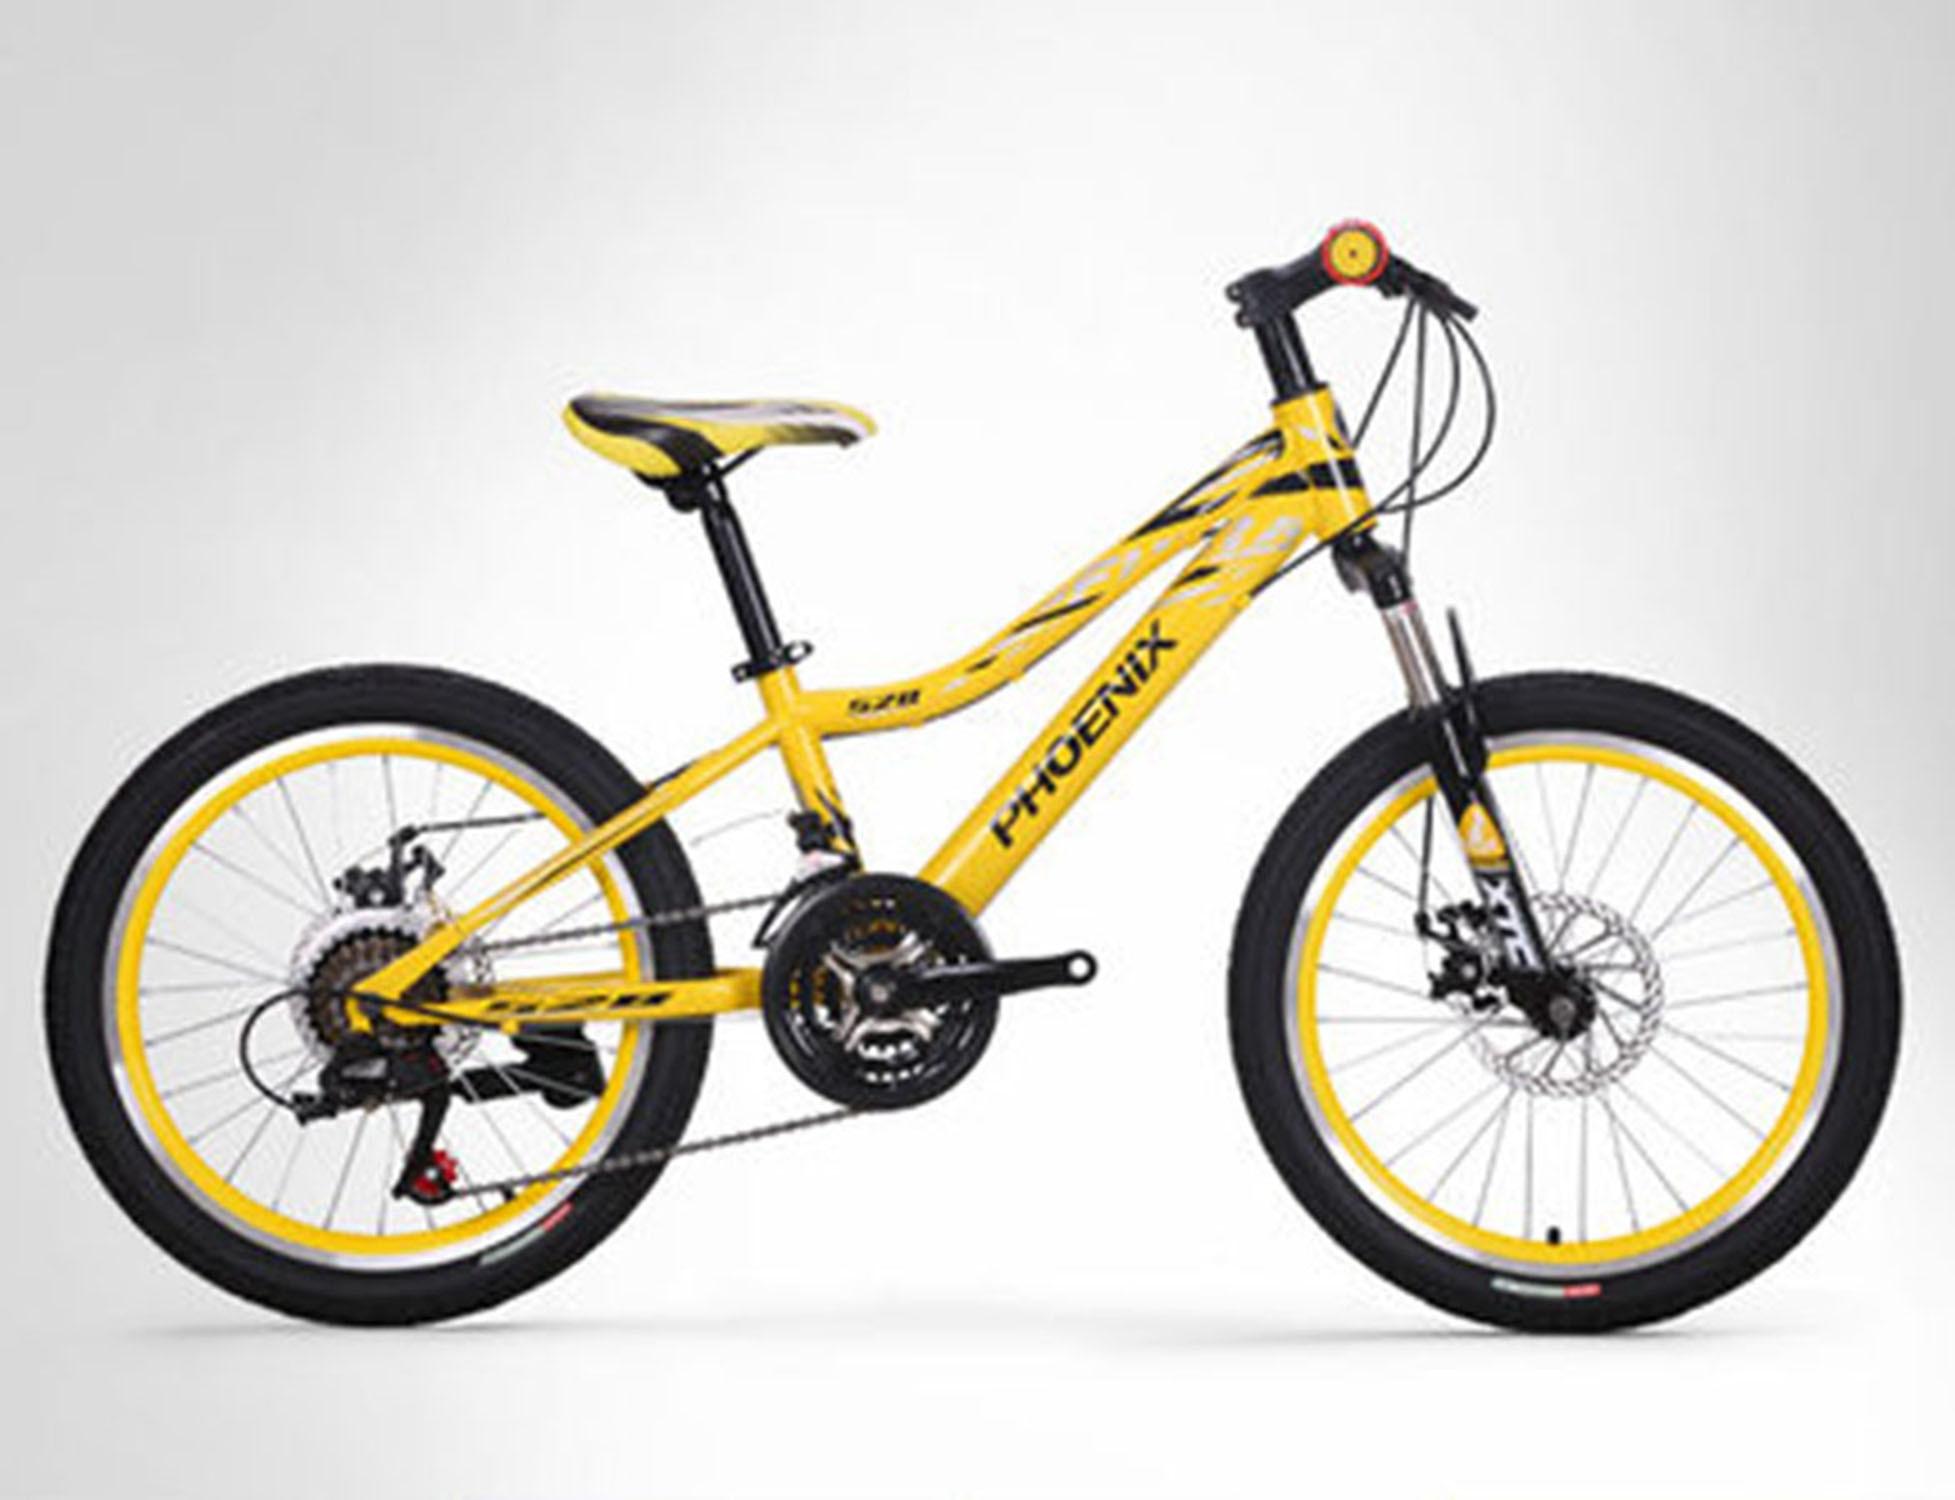 Bicicleta para estudiante de 20 pulgadas, bicicleta con freno de disco de doble velocidad 21